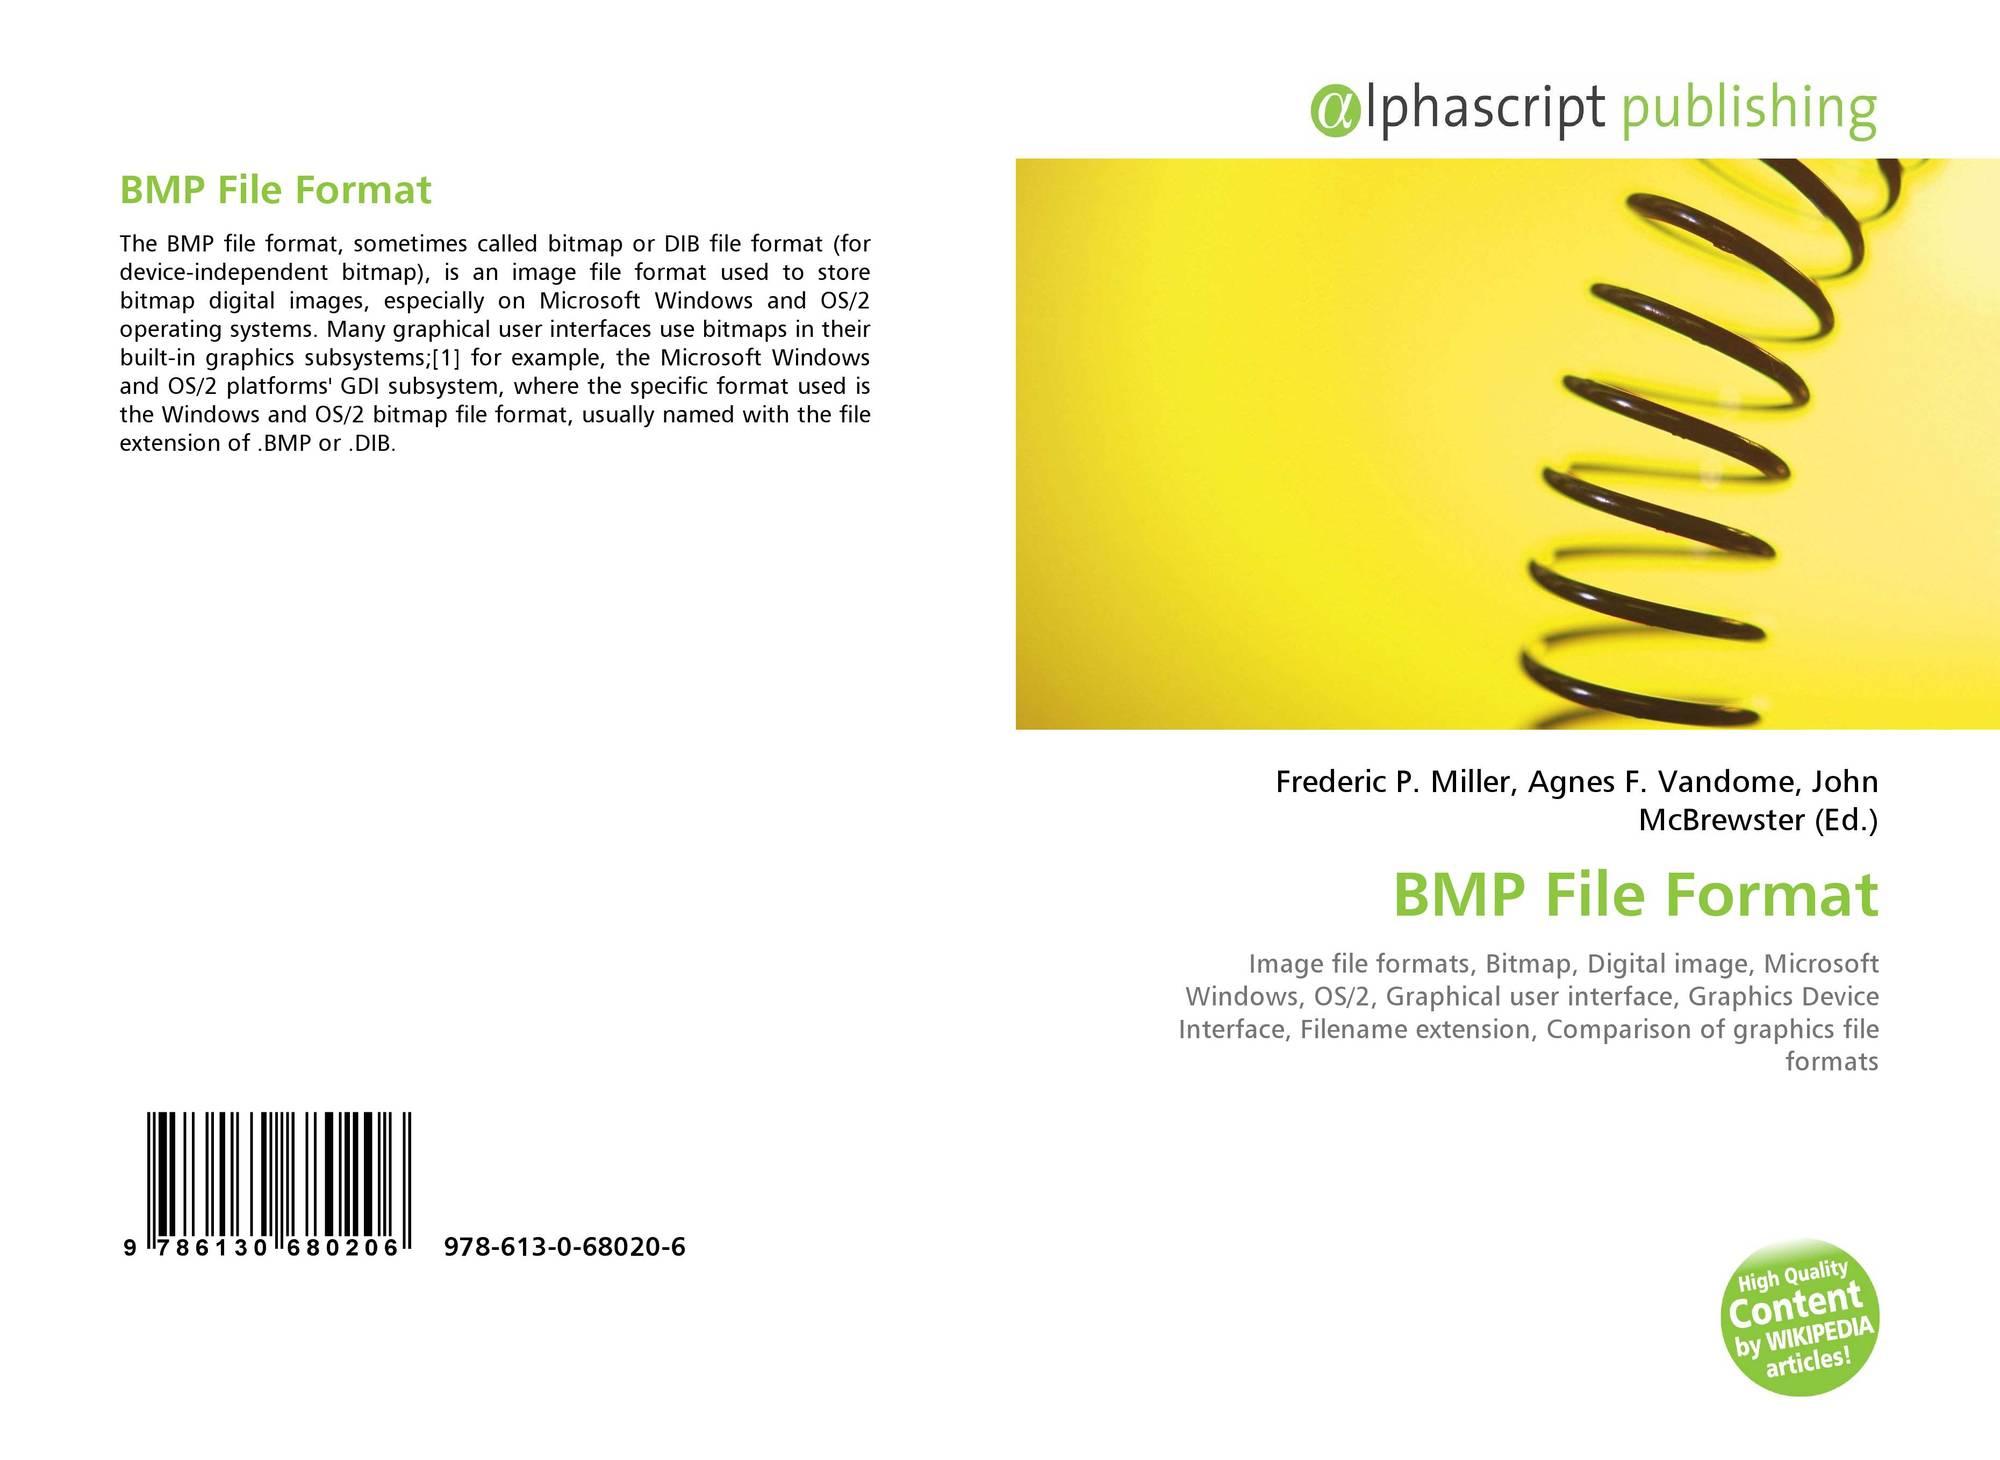 BMP File Format, 978-613-0-68020-6, 6130680201 ,9786130680206